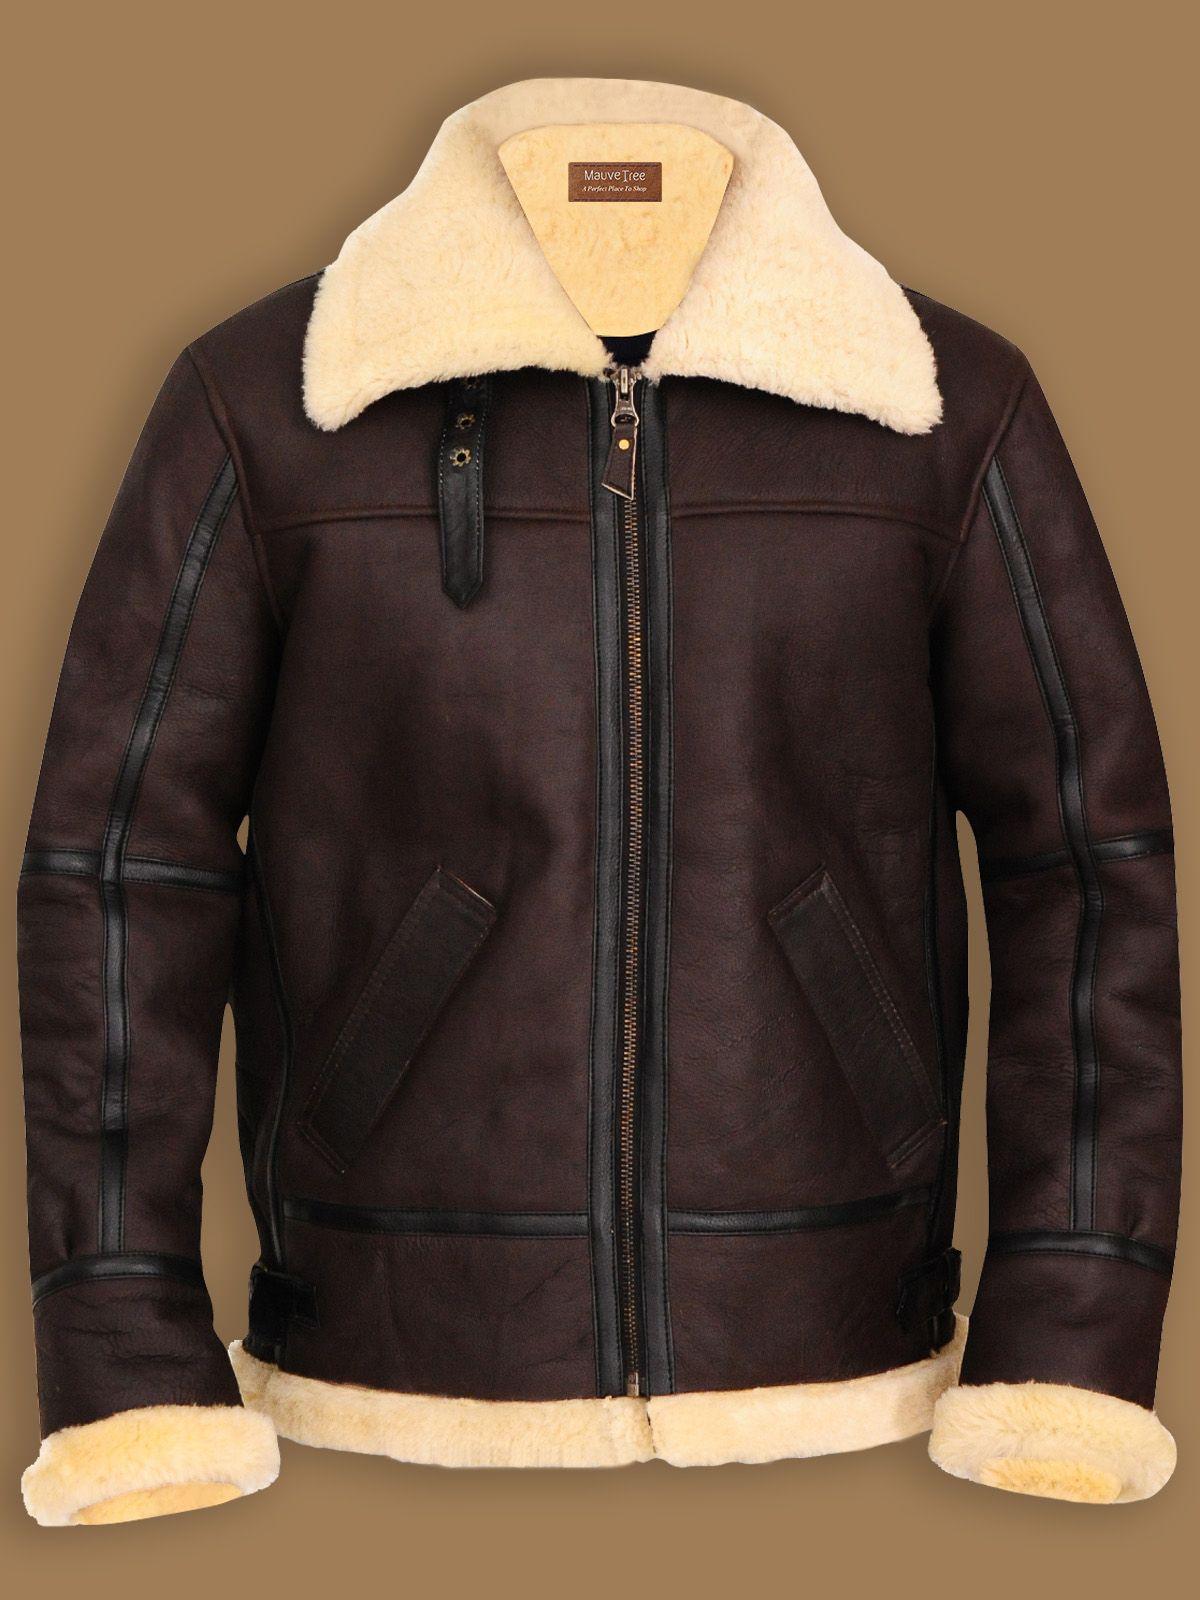 B3 Bomber Aviator Sheepskin Leather Jacket Men Jacket Mauvetree Leather Bomber Jacket Leather Jacket Mens Jackets [ 1600 x 1200 Pixel ]